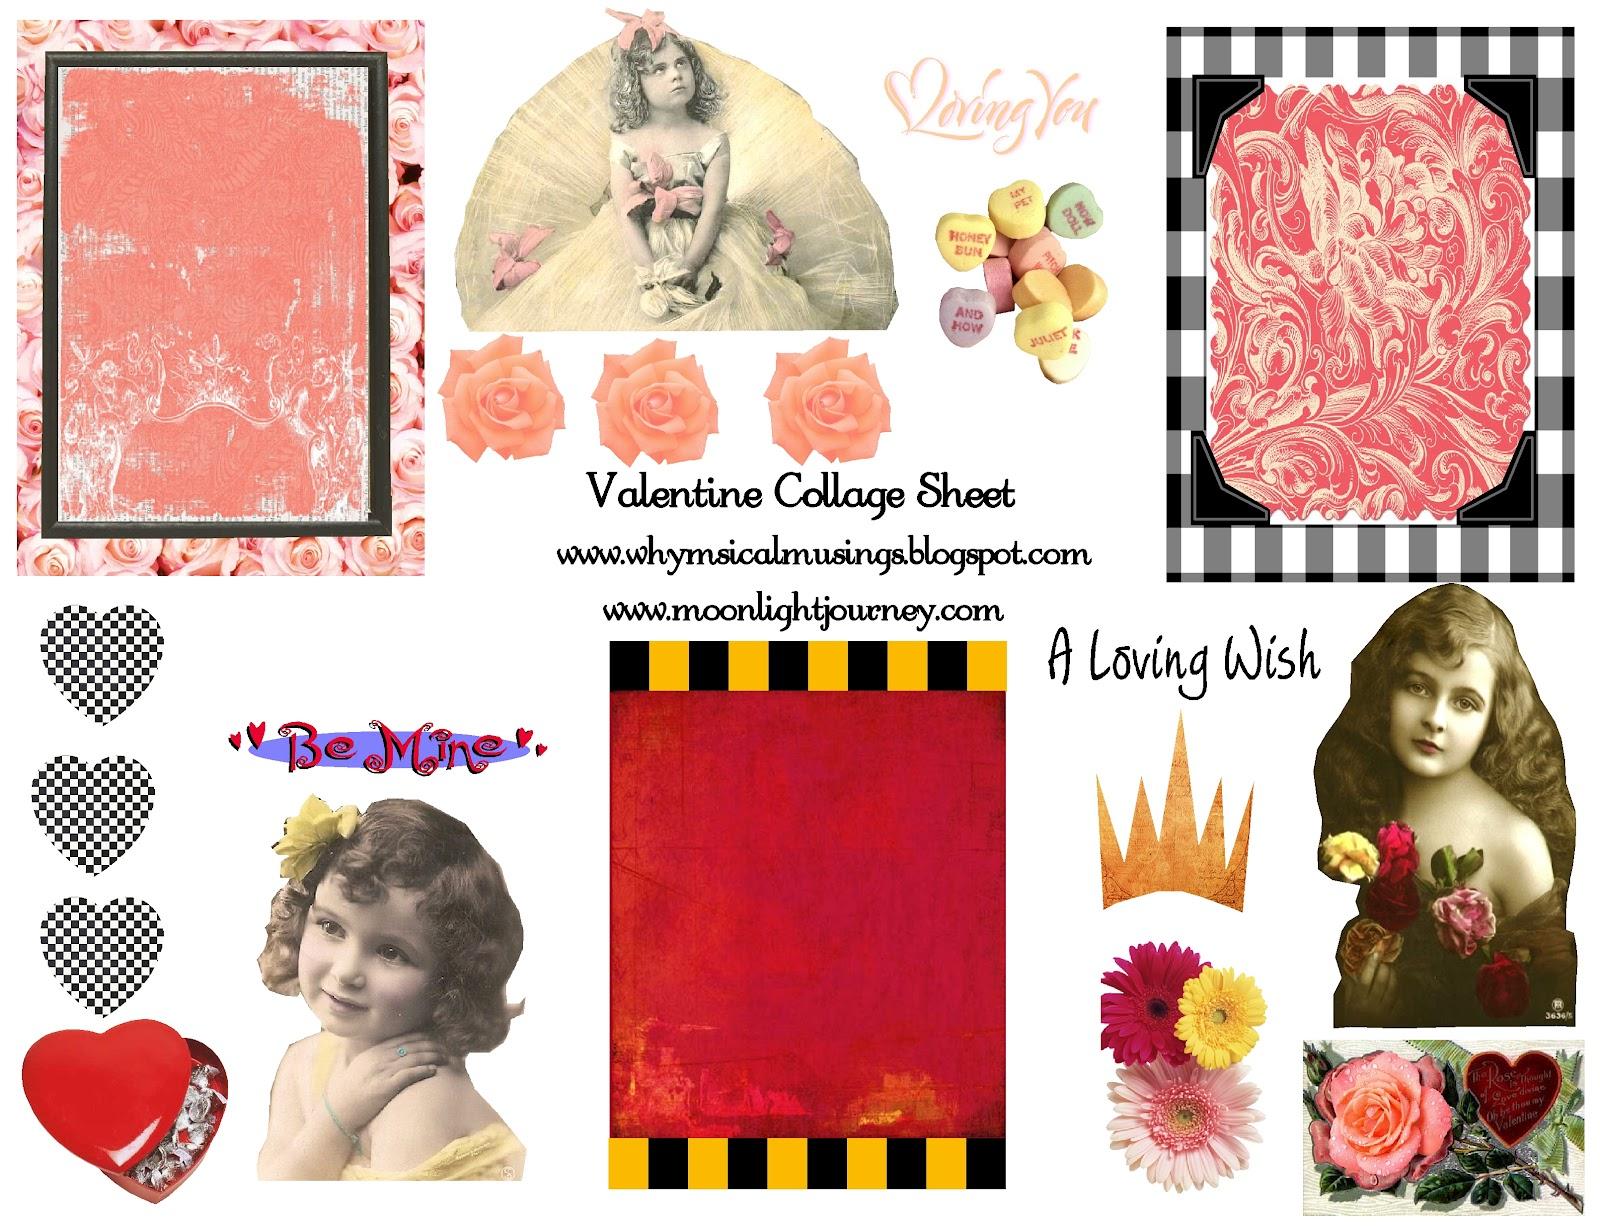 http://1.bp.blogspot.com/-dtF1cY_PtK0/T2ZCeg5gf8I/AAAAAAAABUo/6GsthQ8y2I0/s1600/Valentine+Collage+Sheet.jpg